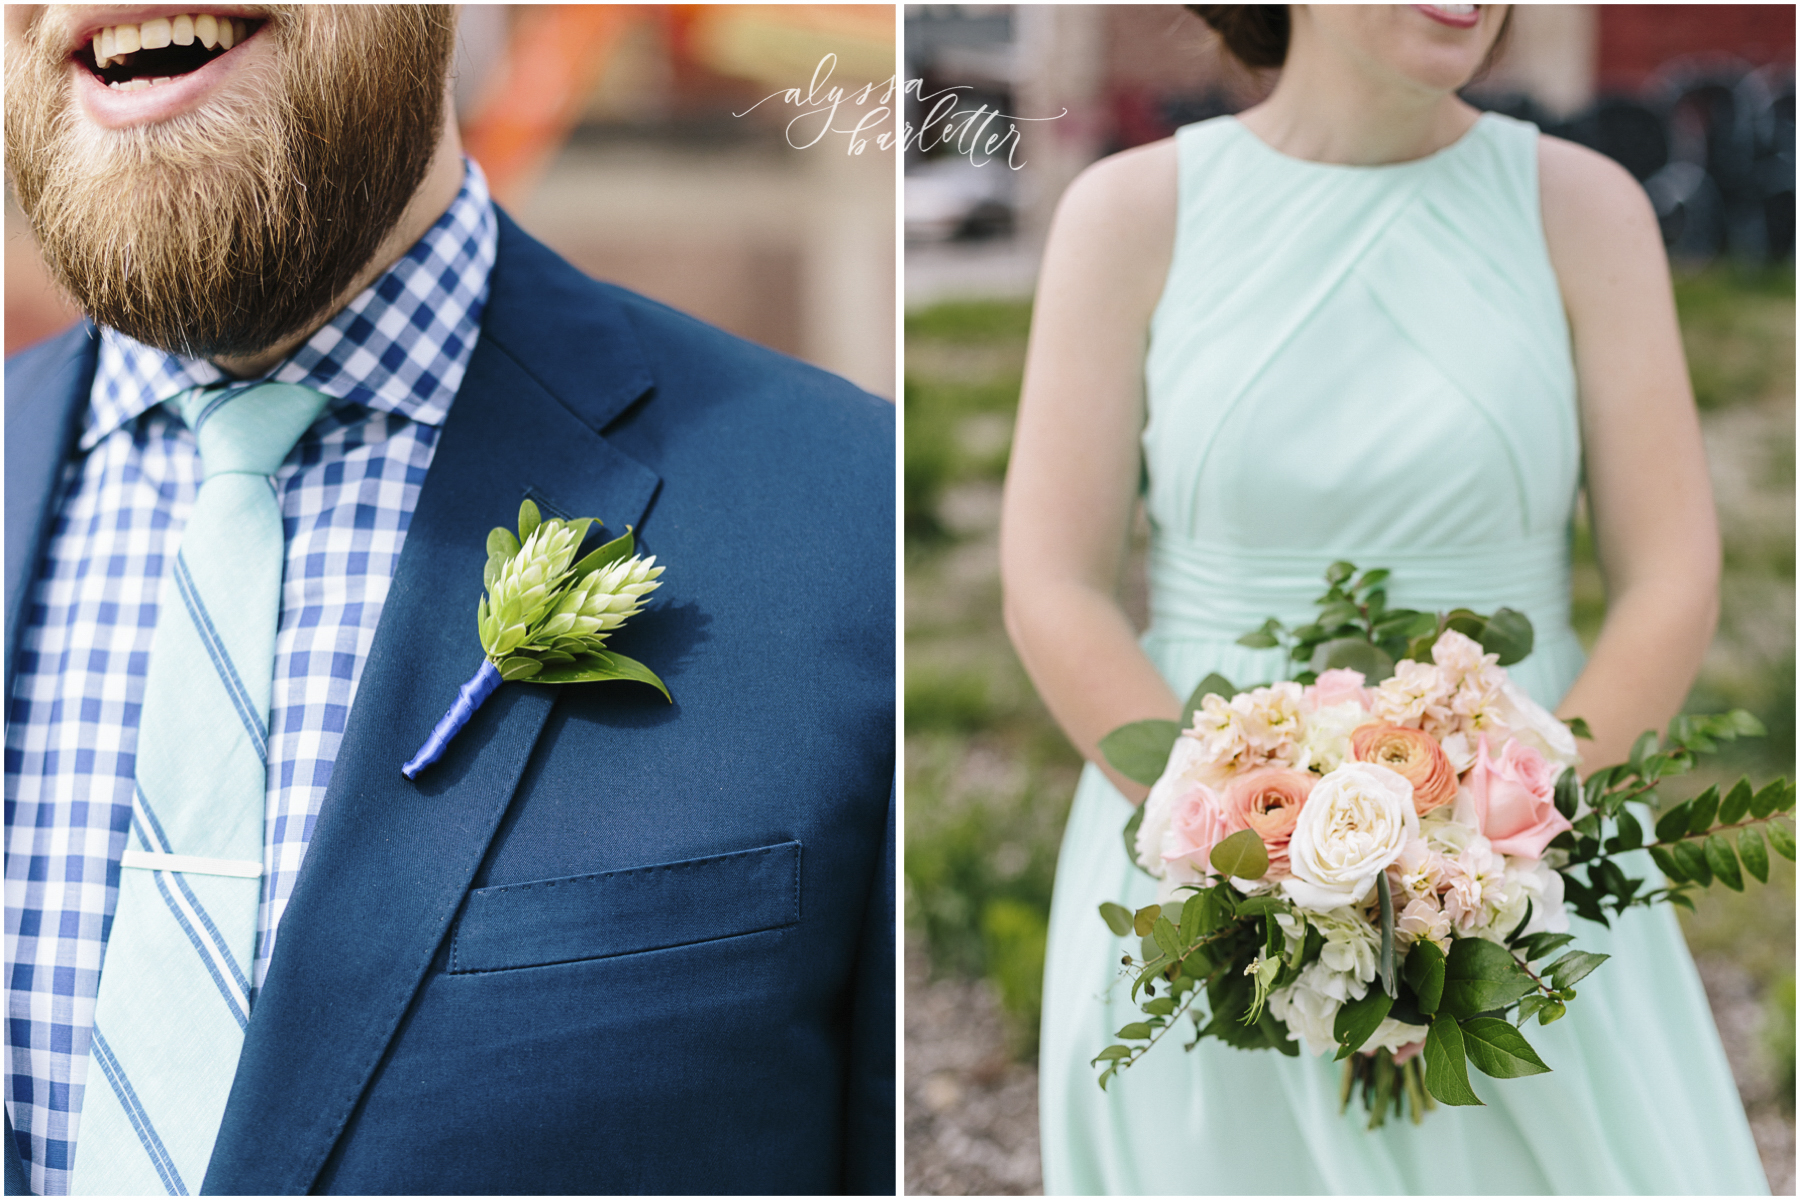 alyssa barletter photography kansas city wedding 2016 main courtney and brian-1-26.jpg